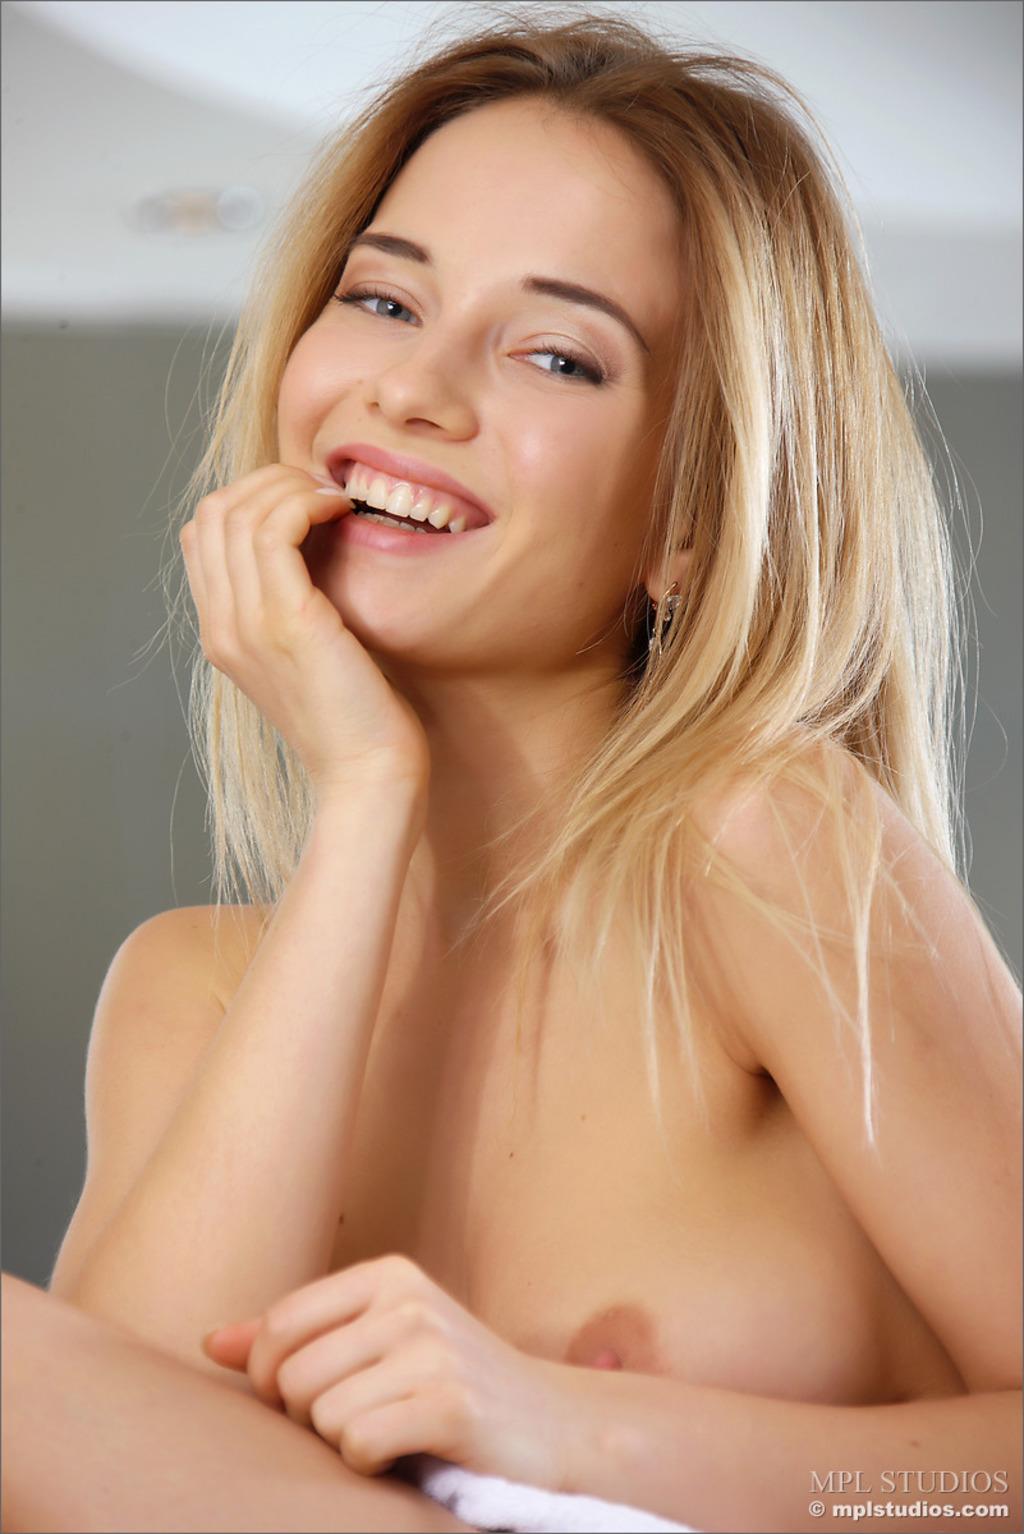 Danica - Make Me Happy 02